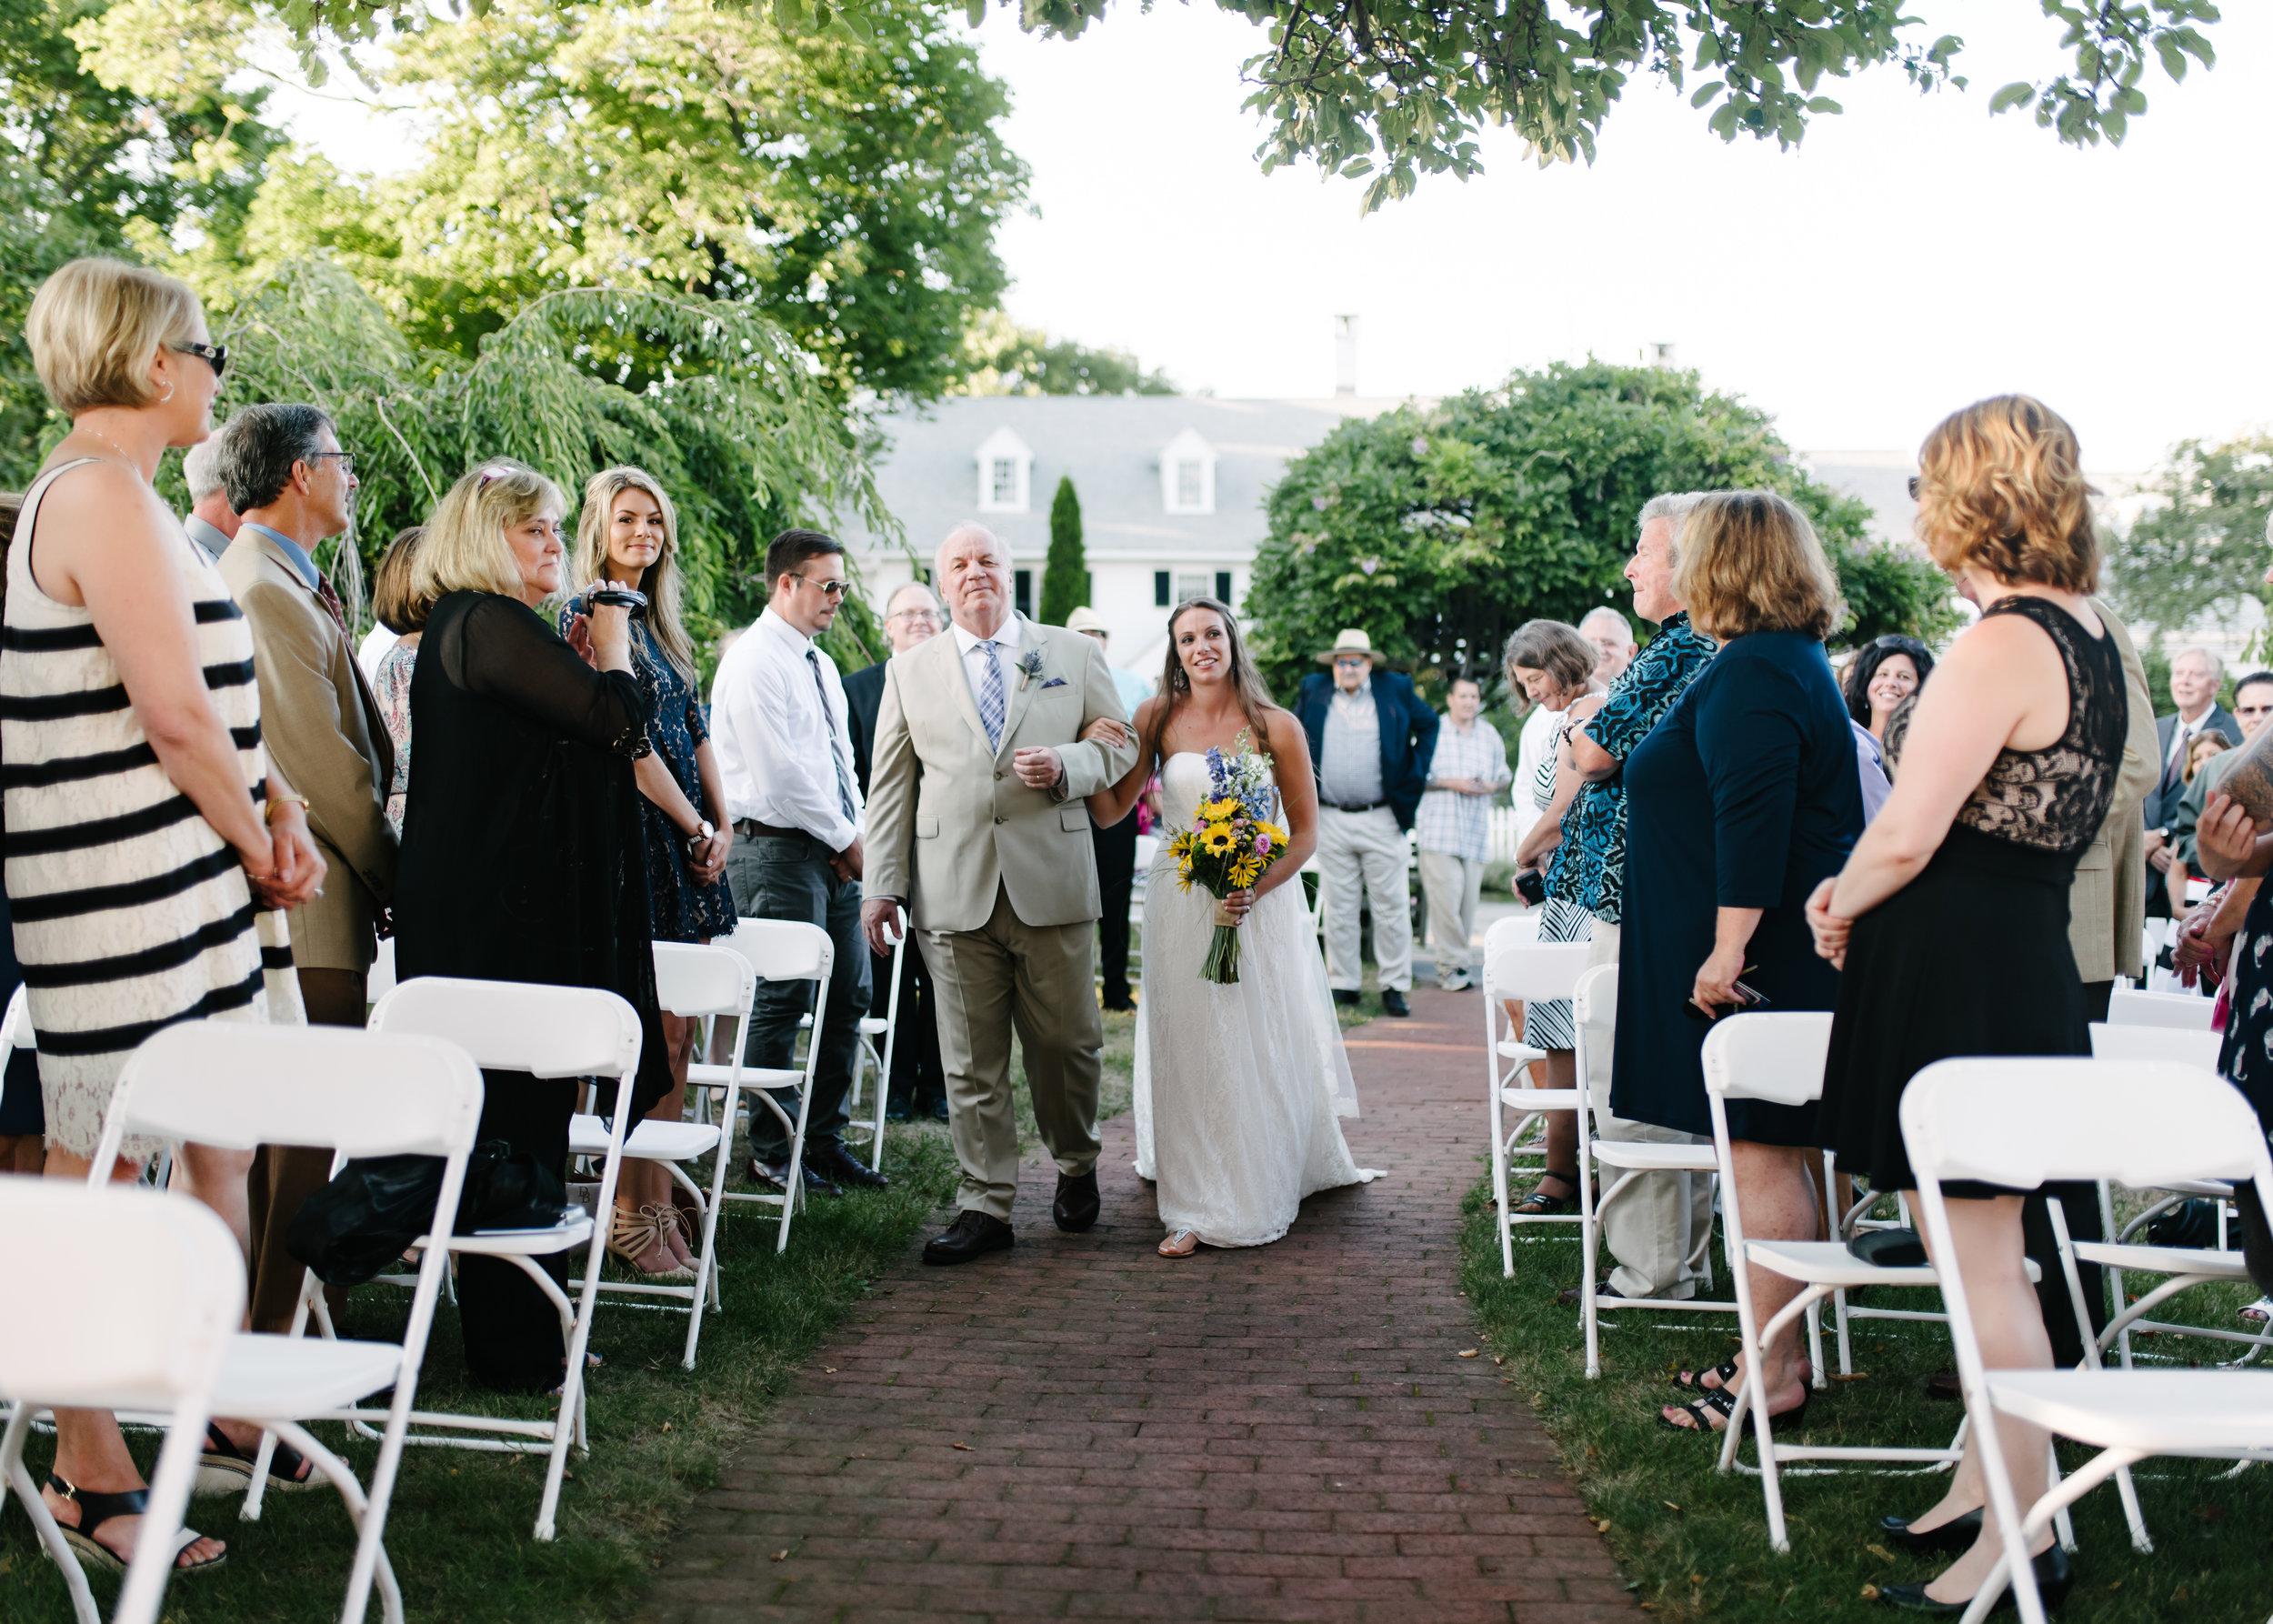 worcester-ma-wedding-photographer-4228.jpg